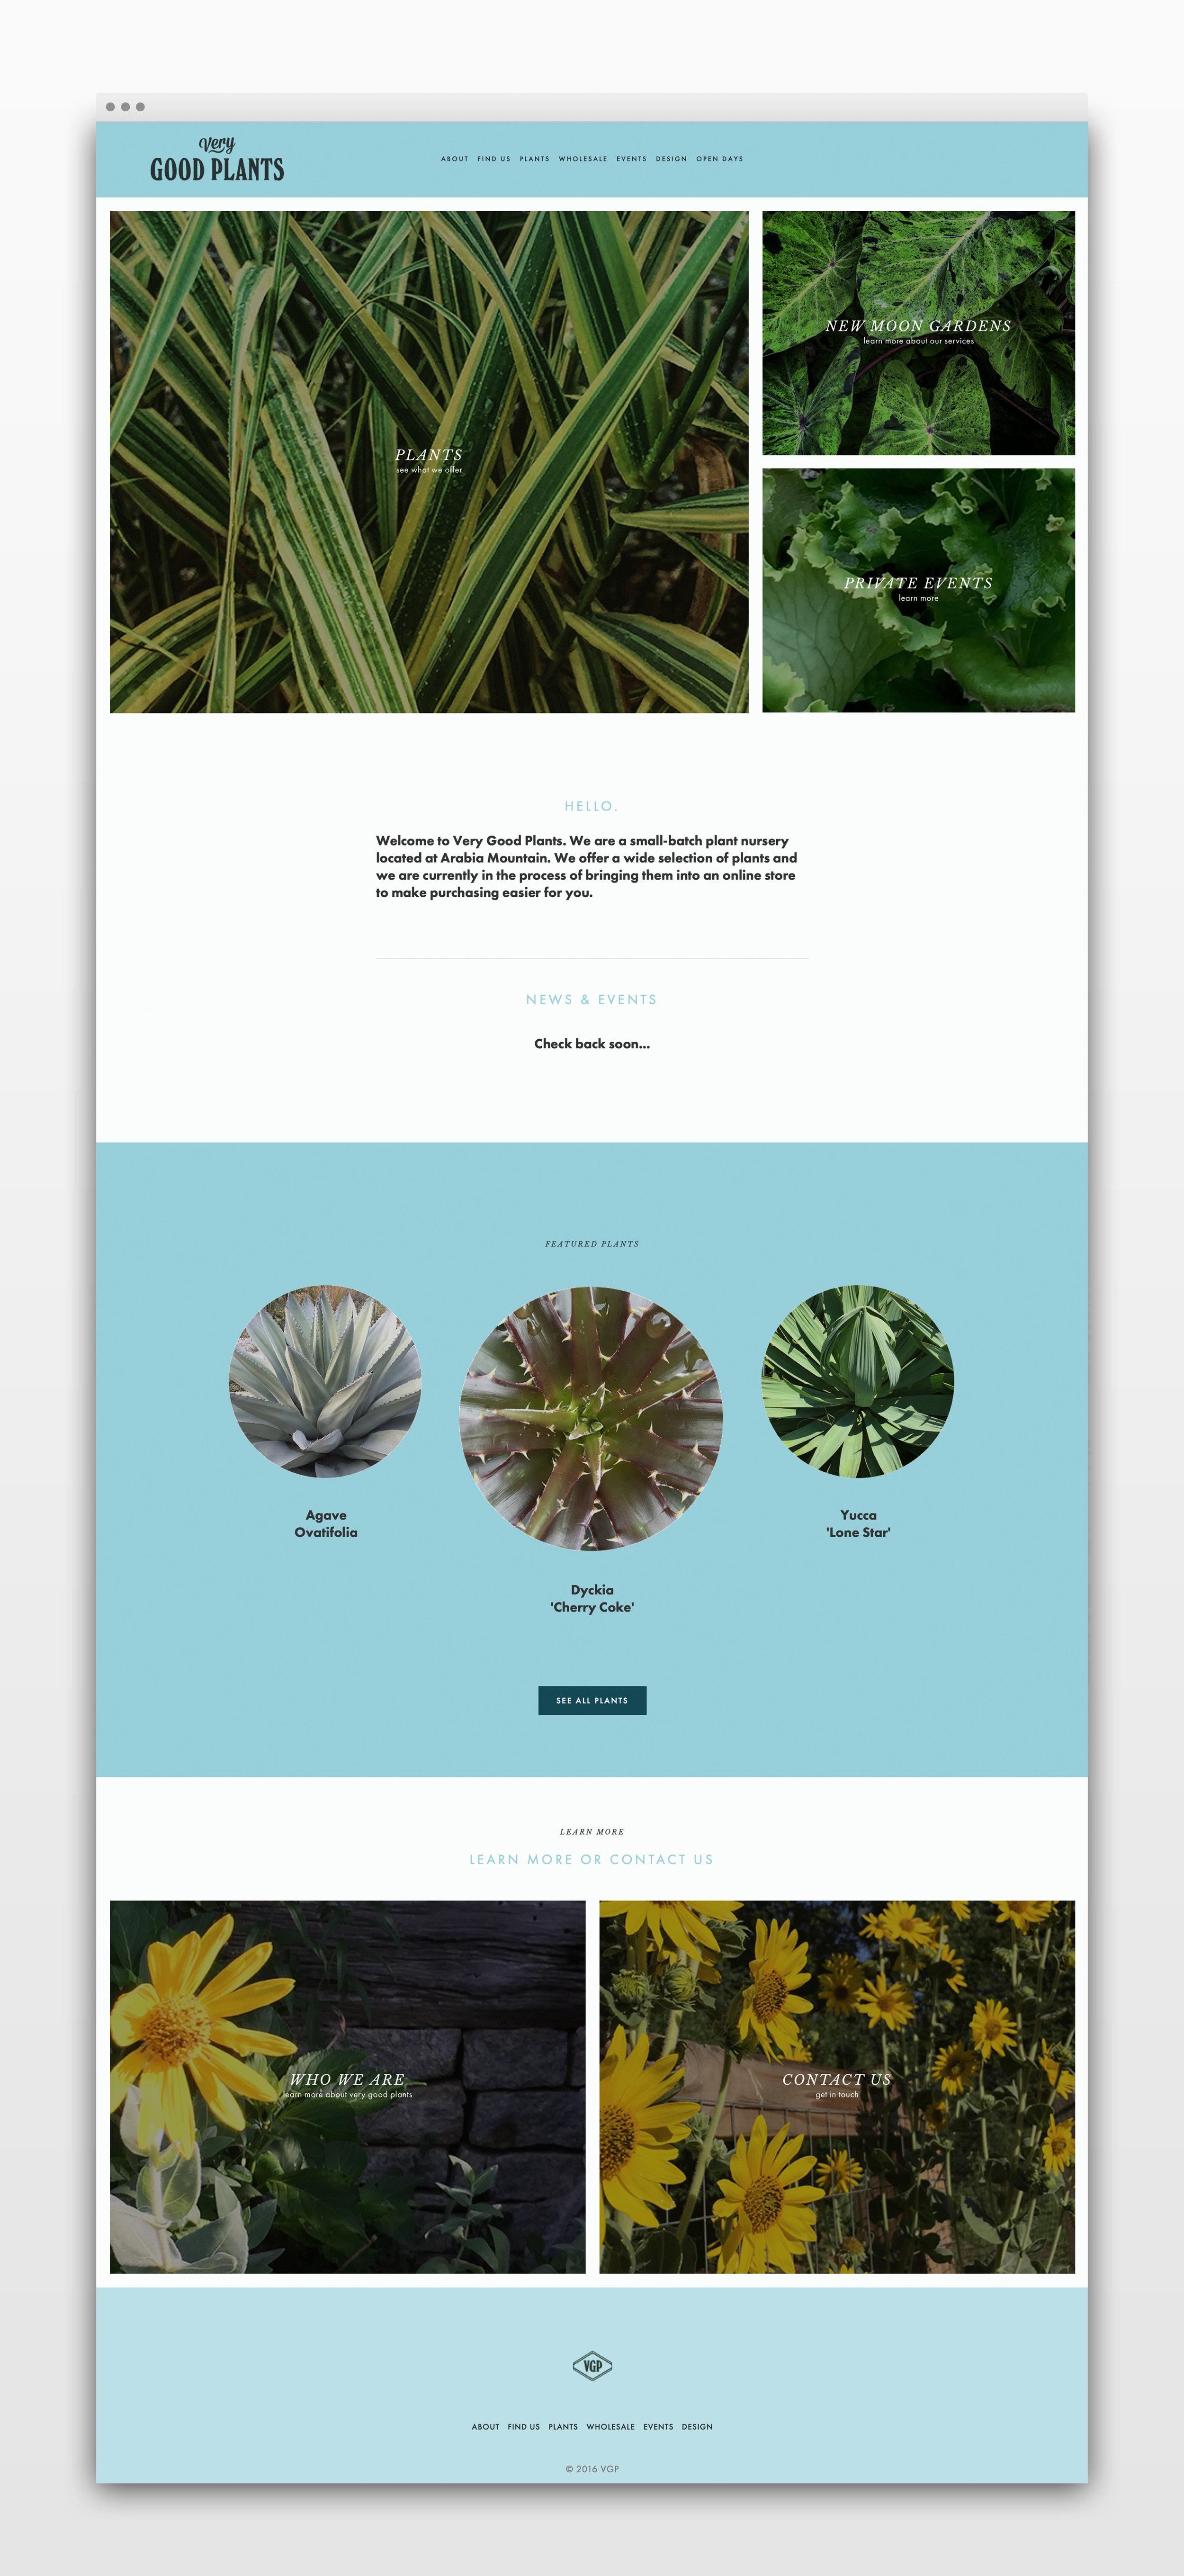 breadvery-good-plants